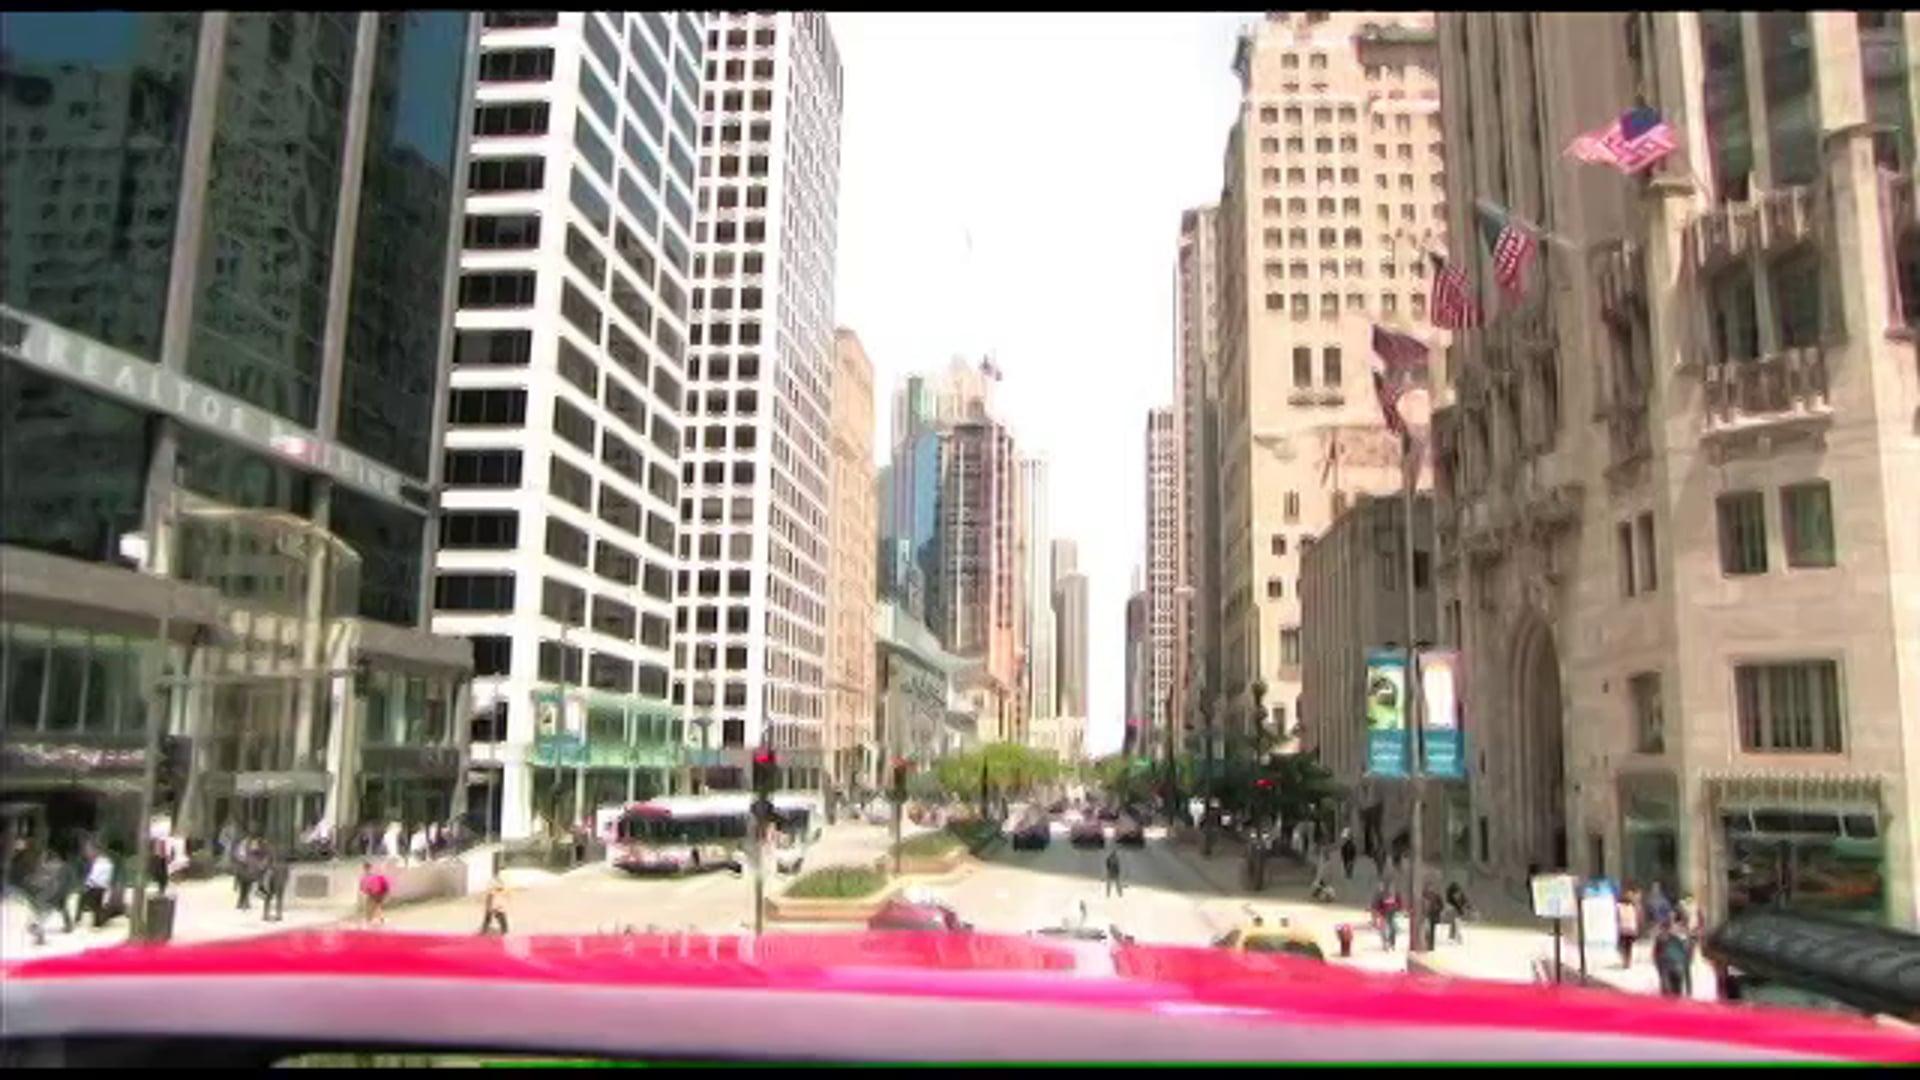 Chicago Trolly, 2011